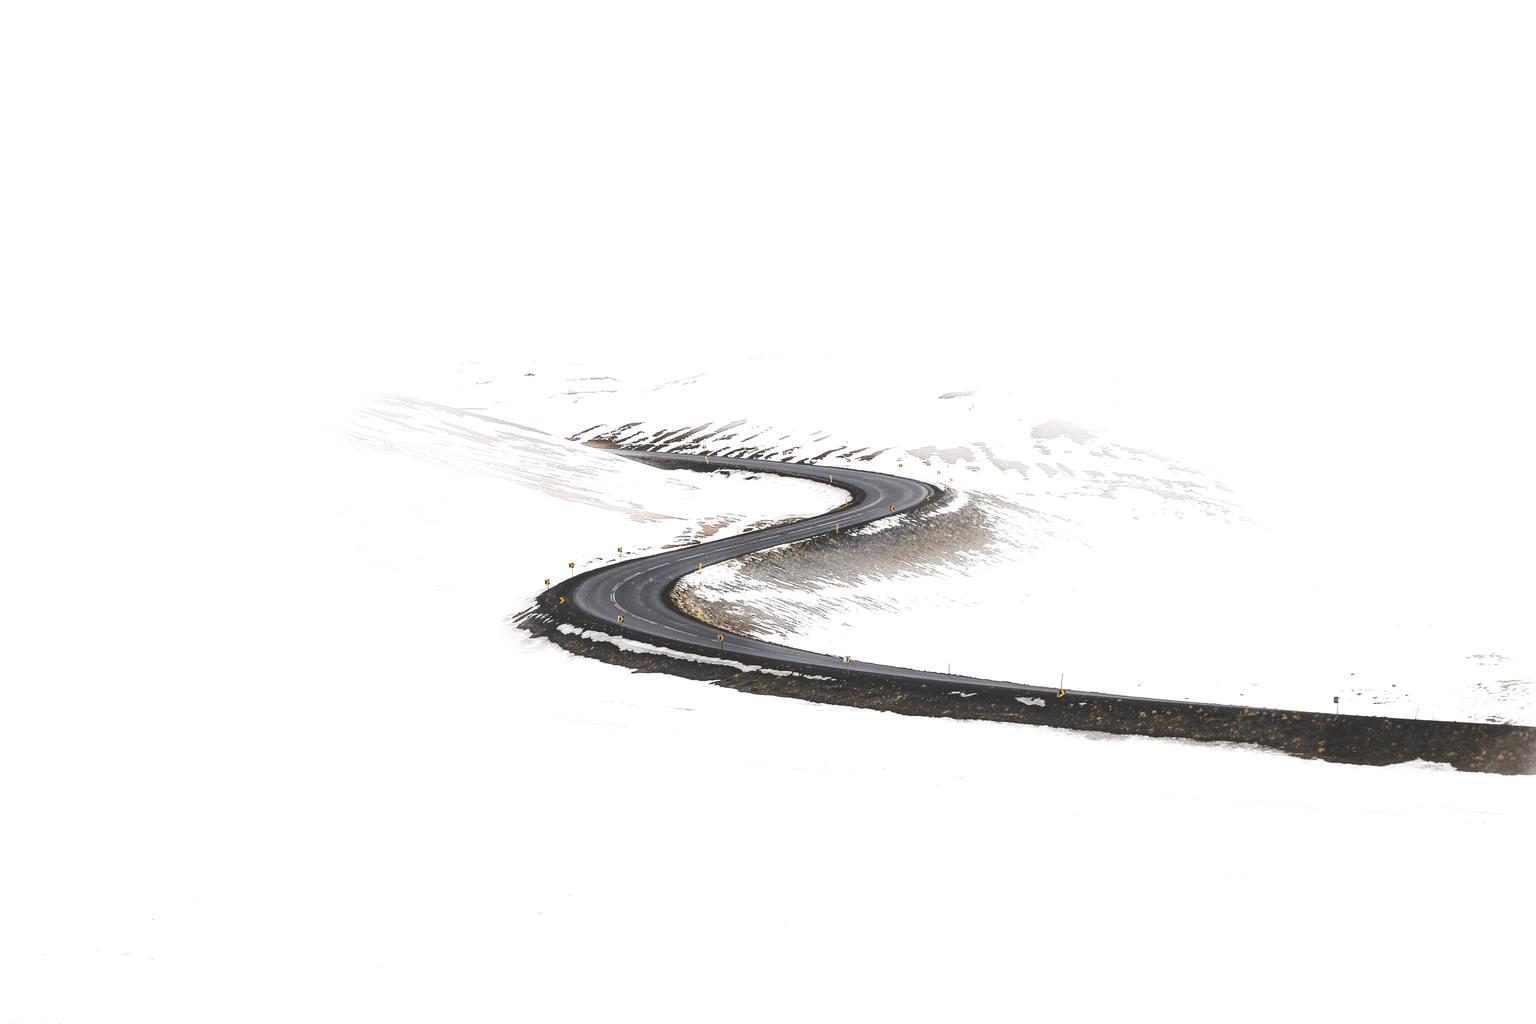 Carretera en S nevada